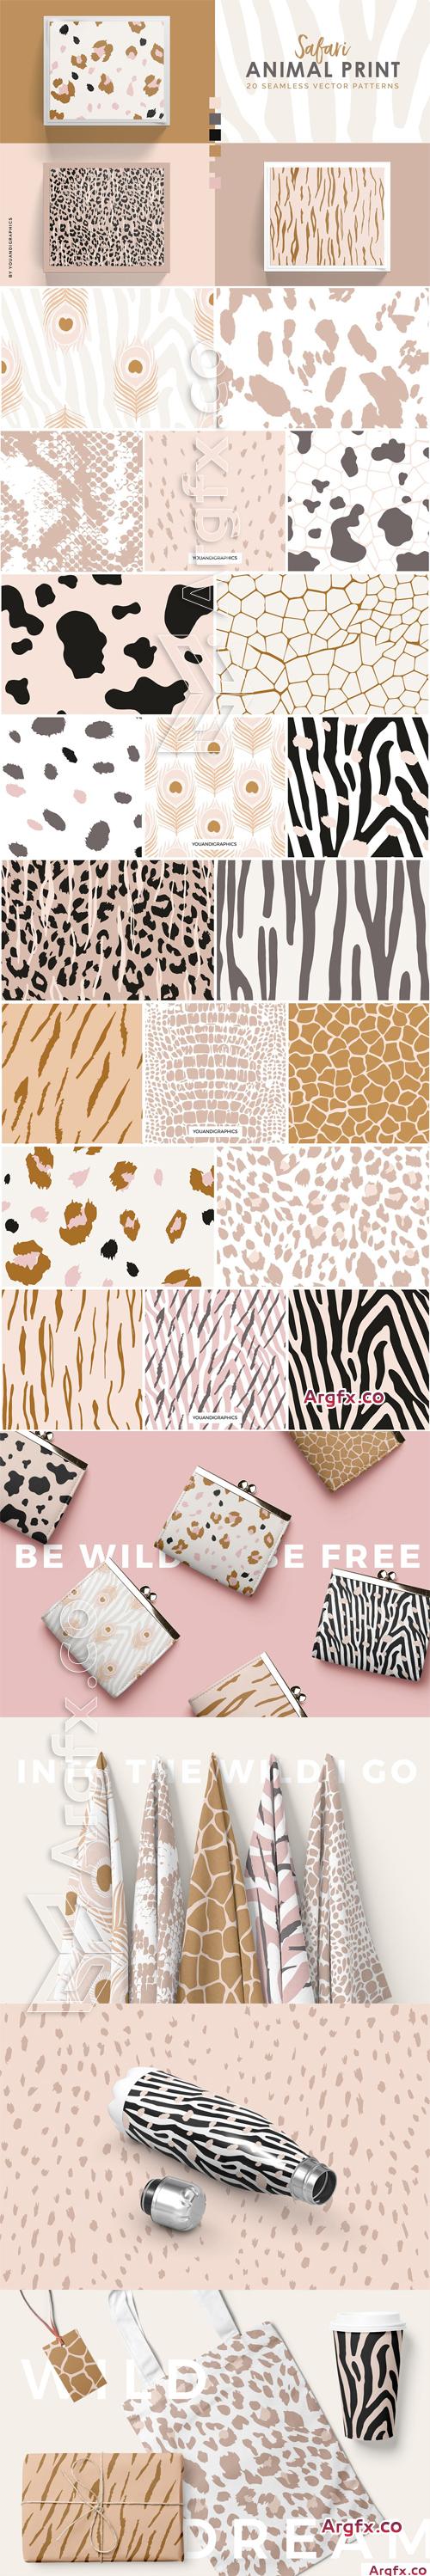 Safari - Animal Print Seamless Vector Patterns